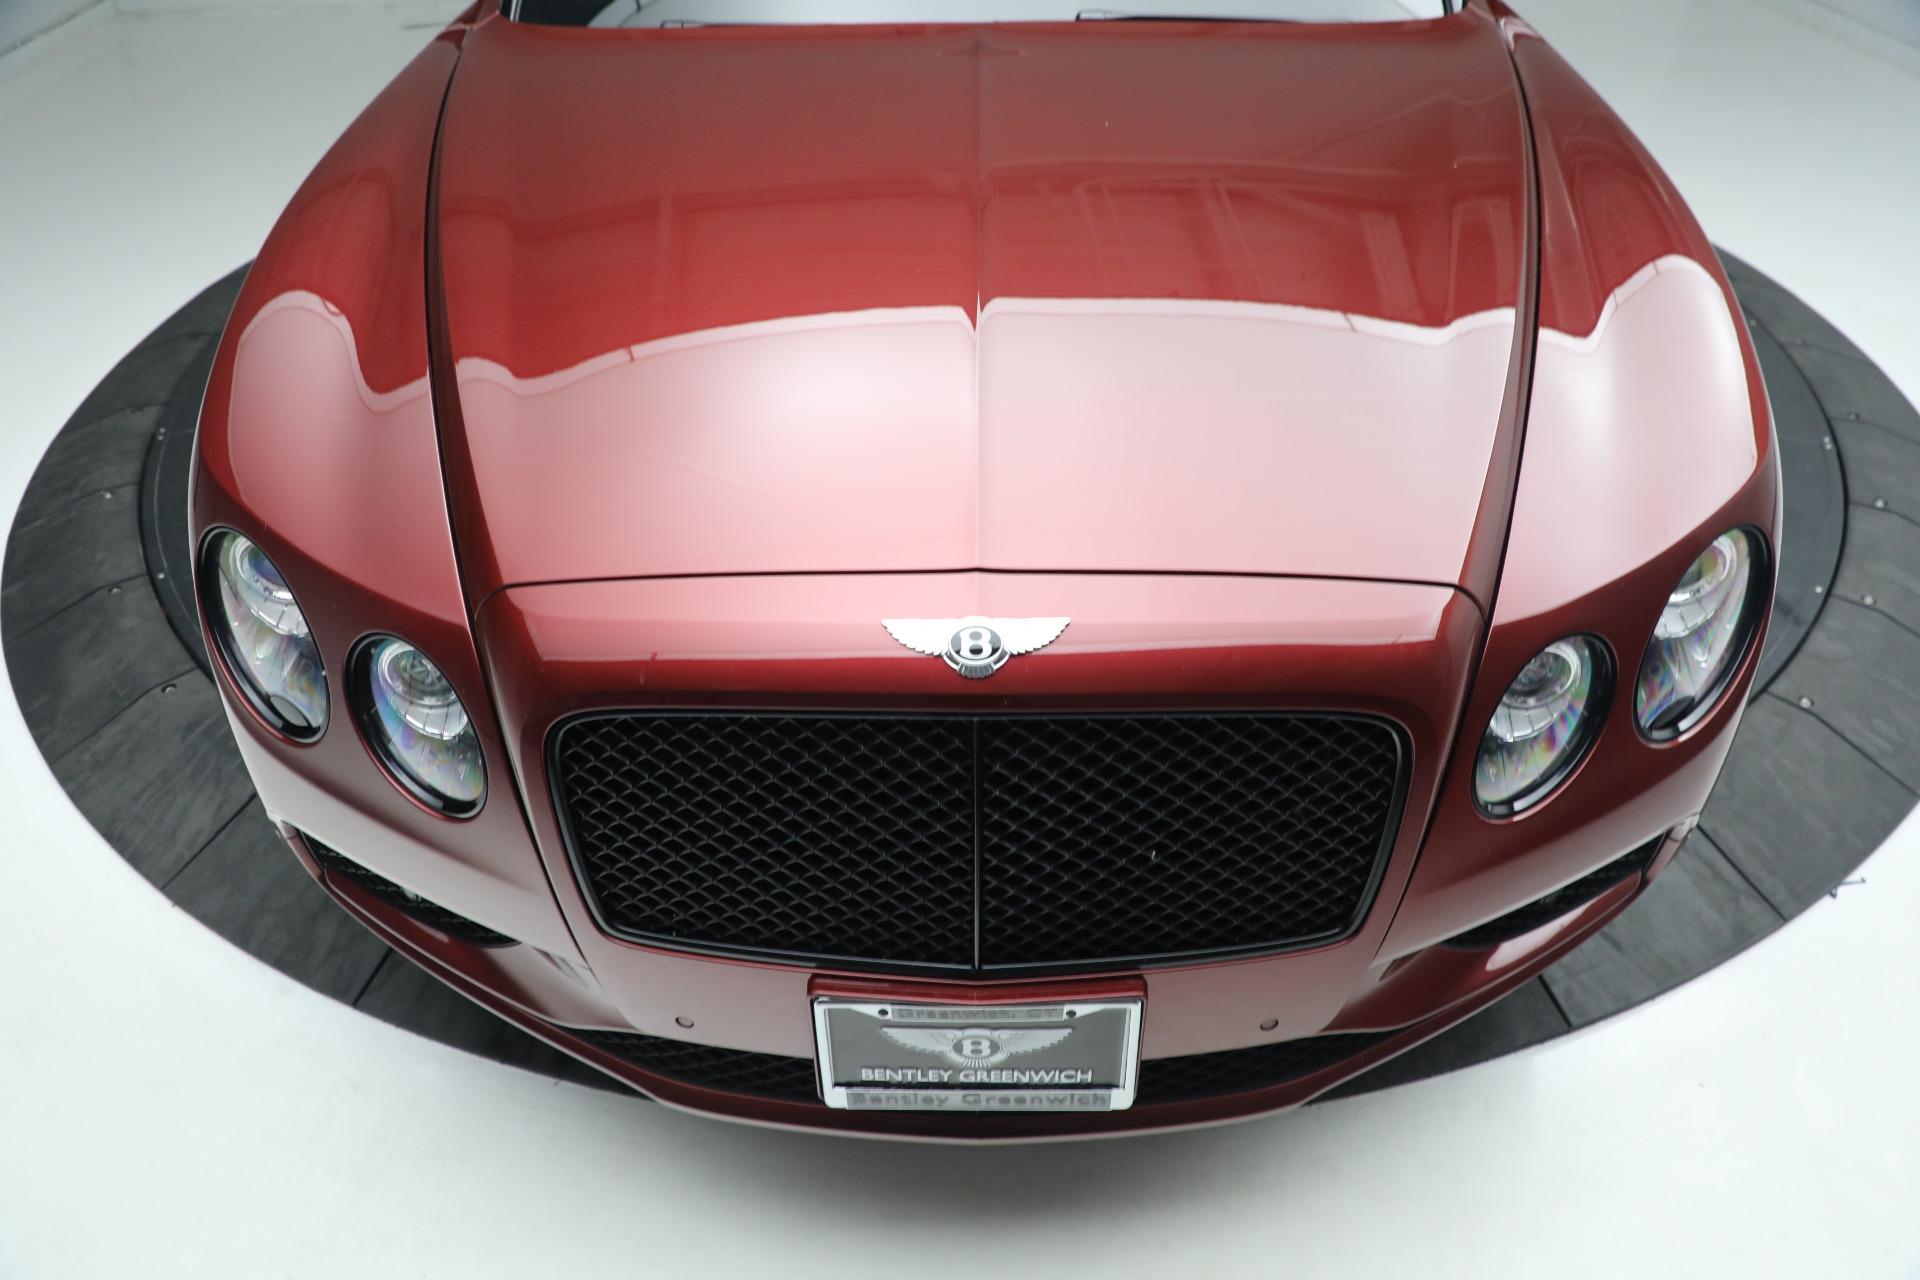 Used 2018 Bentley Flying Spur W12 S For Sale In Westport, CT 3014_p13